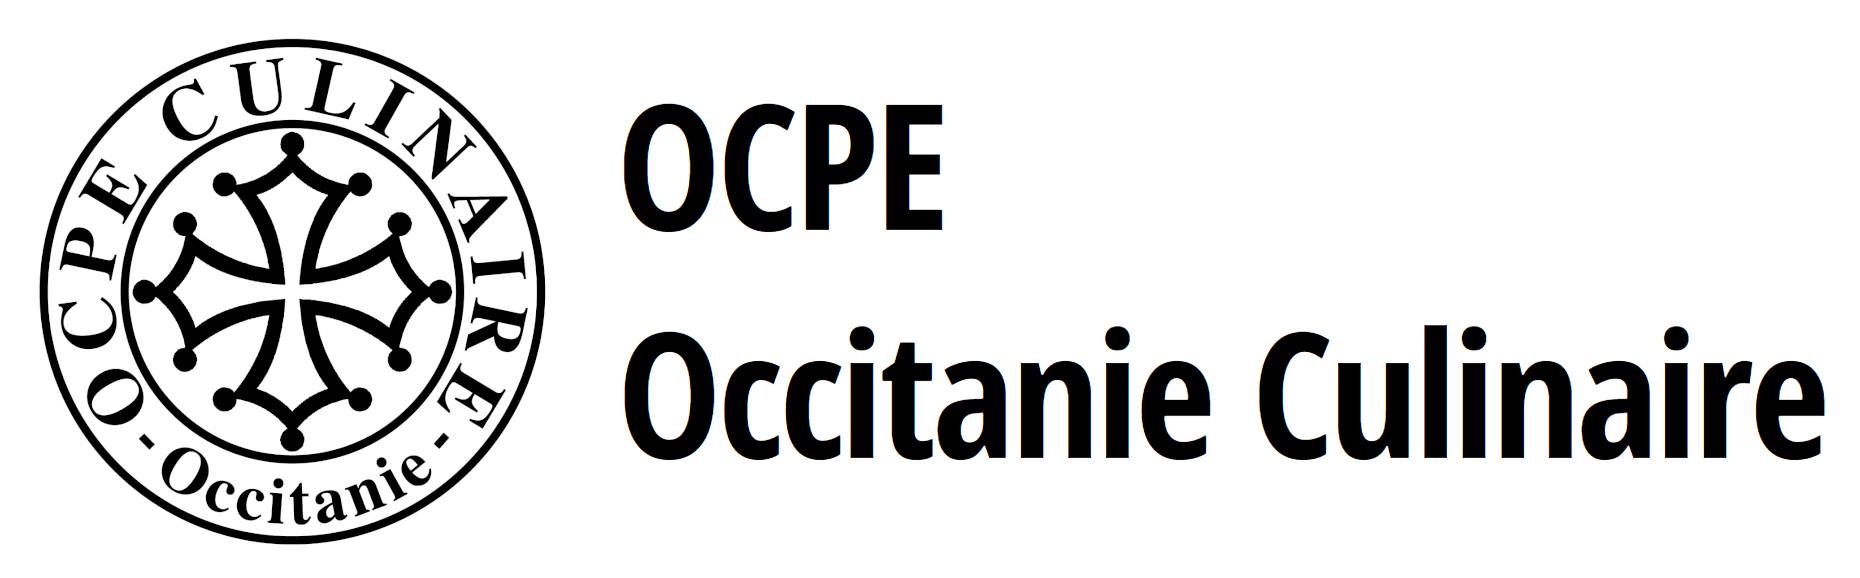 OCPE – Occitanie Culinaire